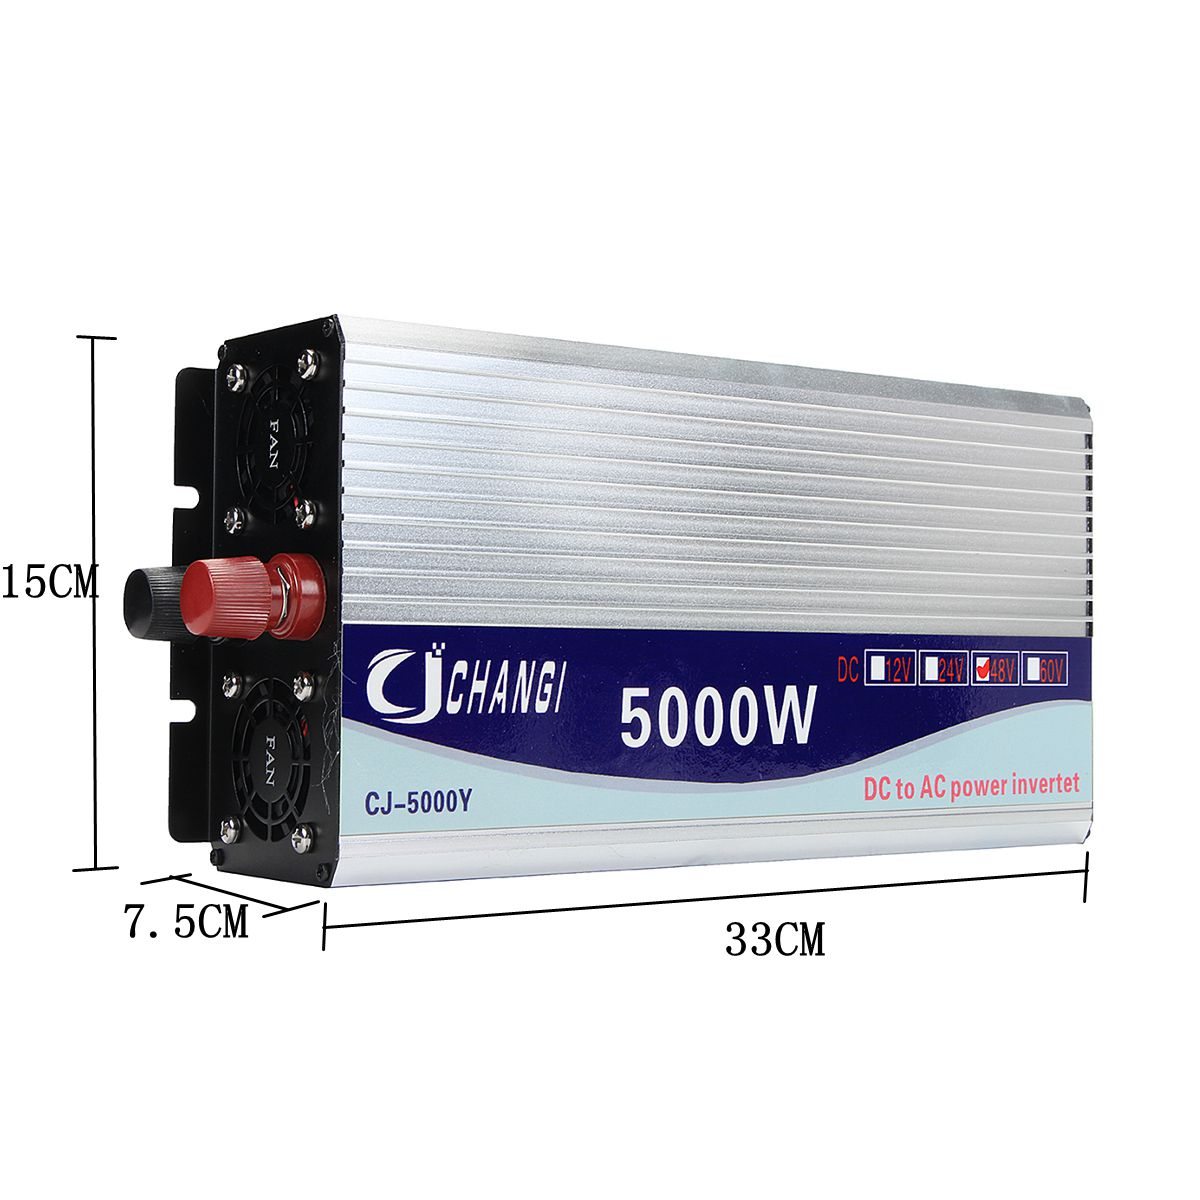 Onduleur 12 V/24 V/48 V 220V 5000W 10000W pics onduleur à onde sinusoïdale modifiée transformateur de tension convertisseur + écran LCD - 5